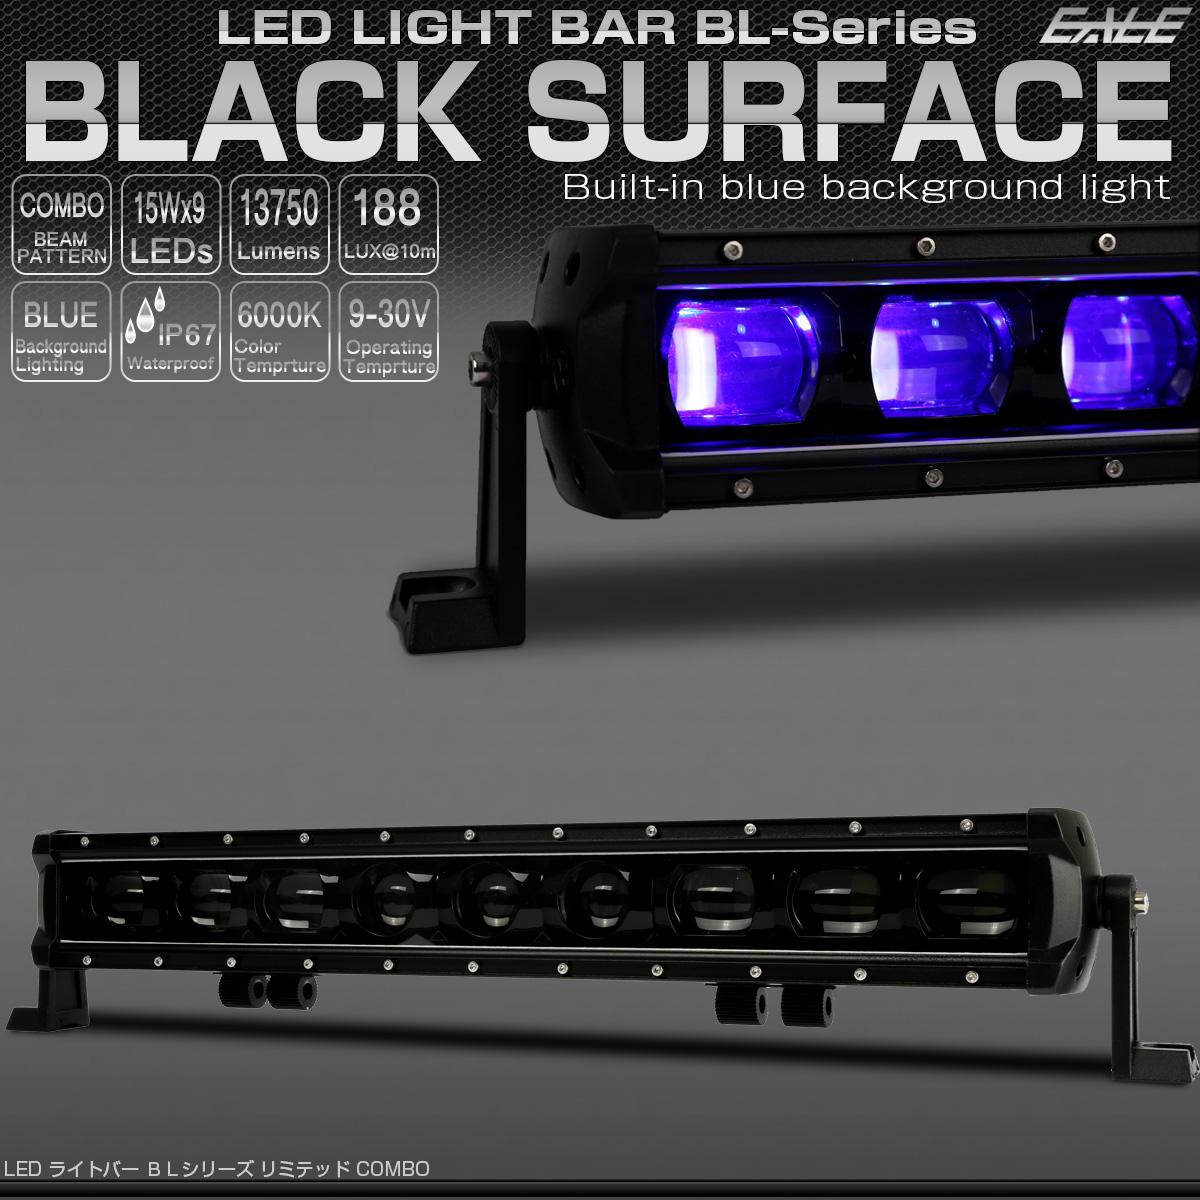 LEDライトバー 135W 21インチ 限定コンボ ブルー バックライト内蔵 ブラックインナー スポット 13750lm 12V 24V 防水IP67 作業灯 ZZP-543